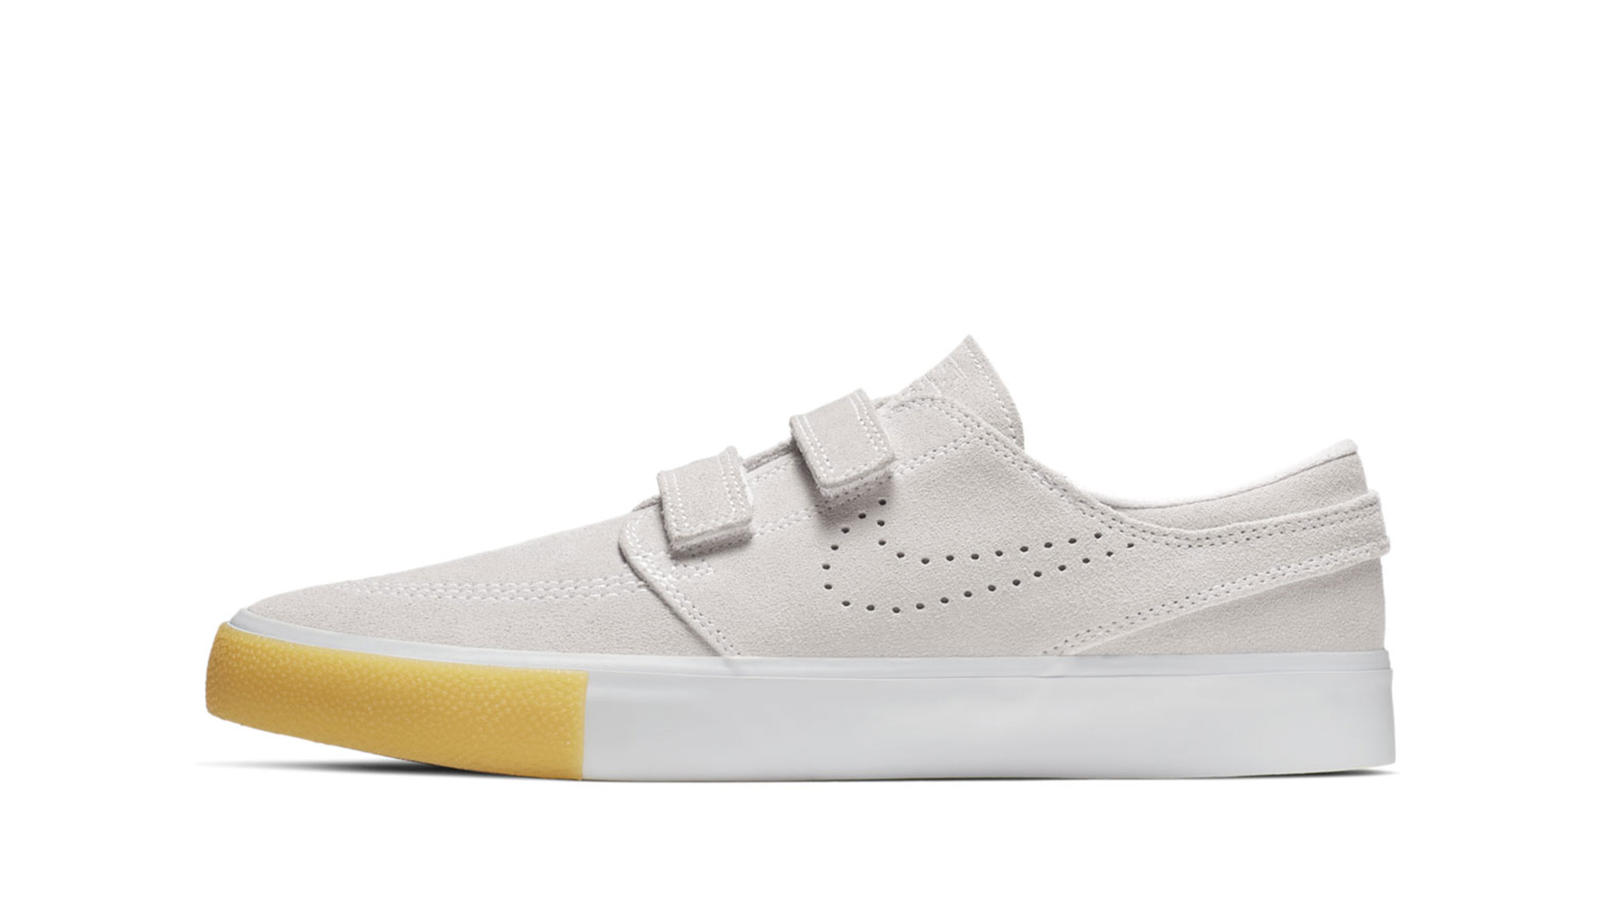 Nike SB Zoom Stefan Janoski RM 0